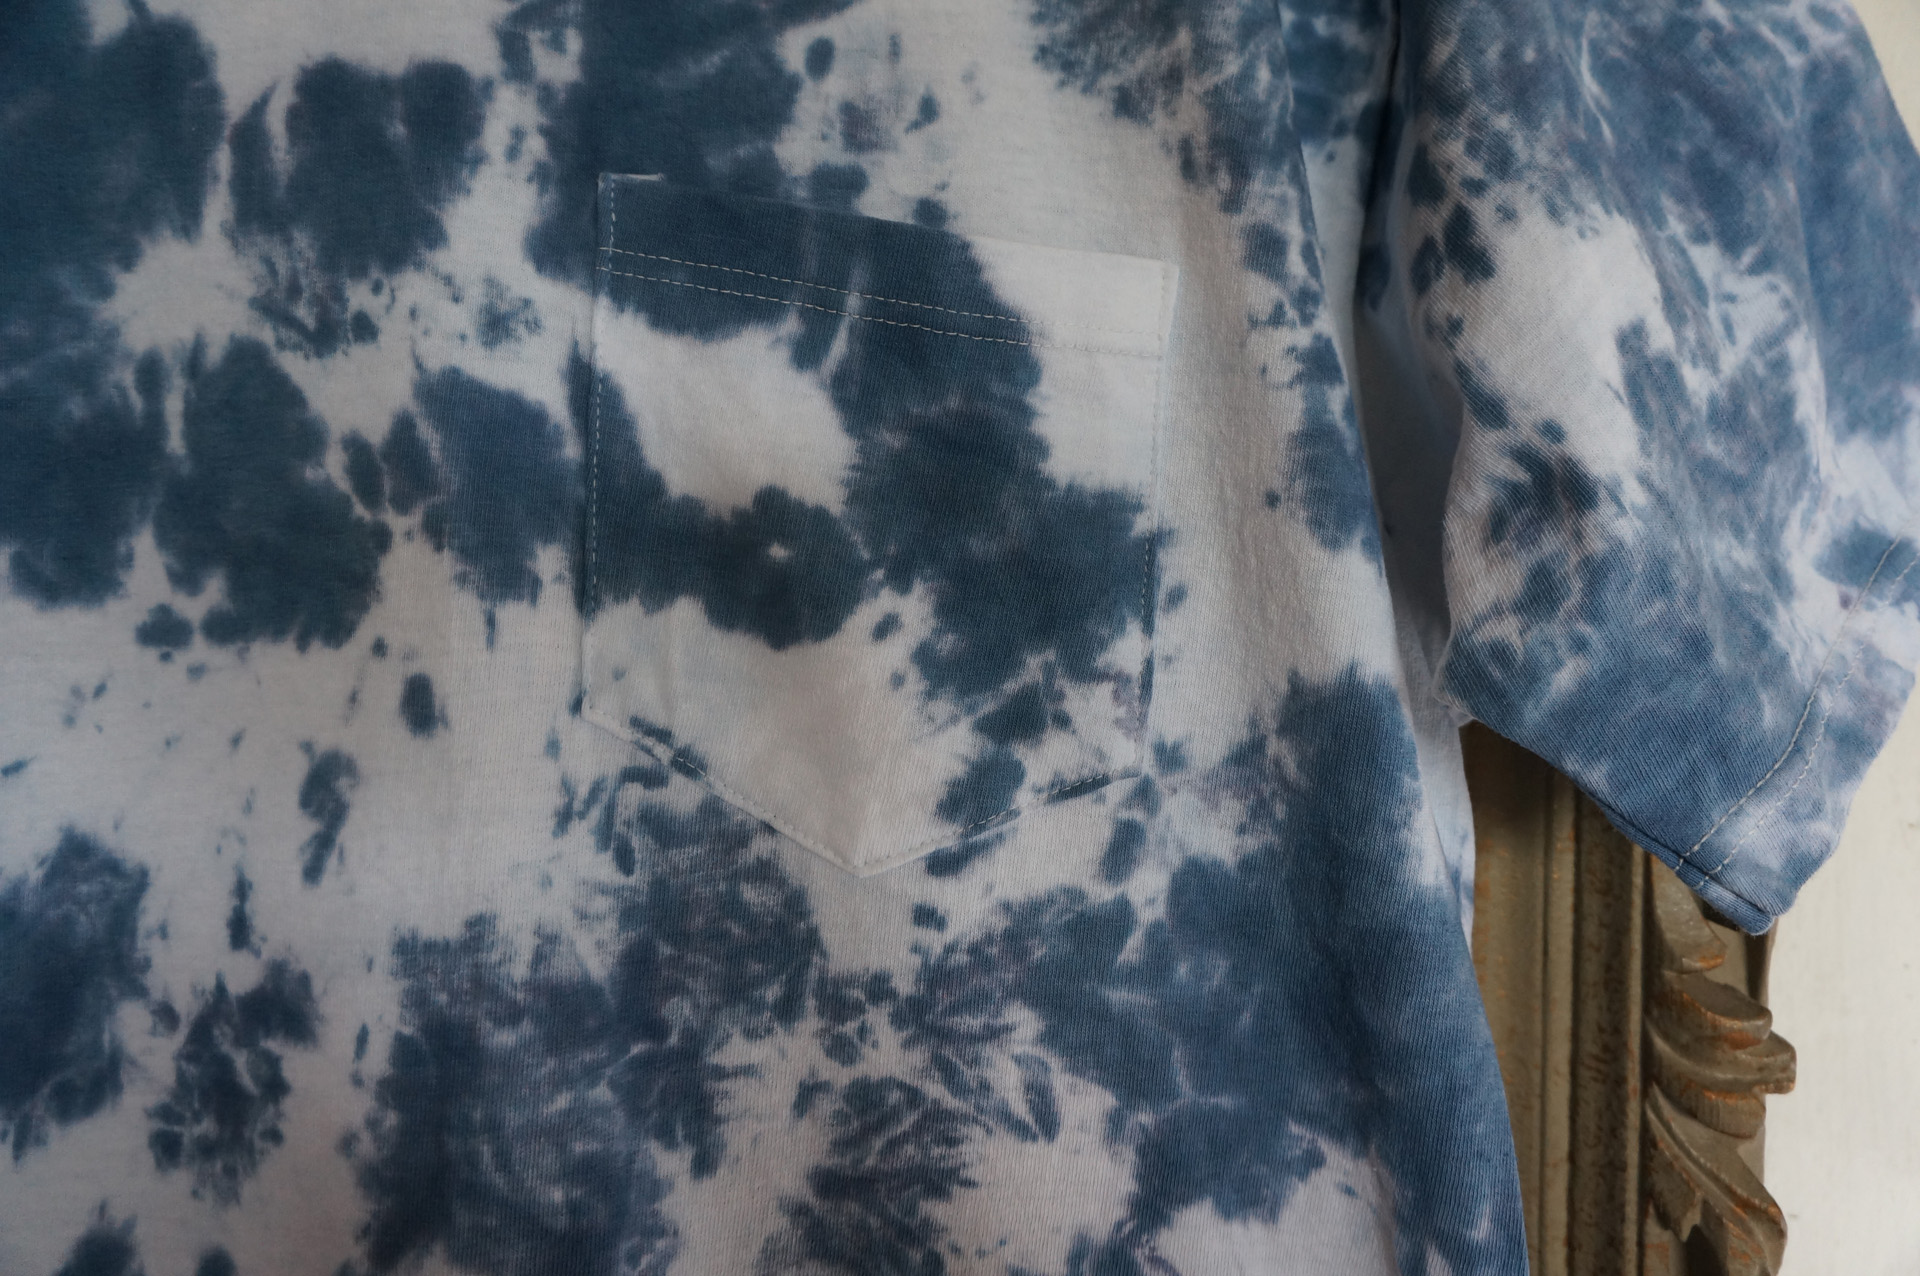 neutral ニュートラル タイダイtシャツ surgecoaststore サージコーストストア